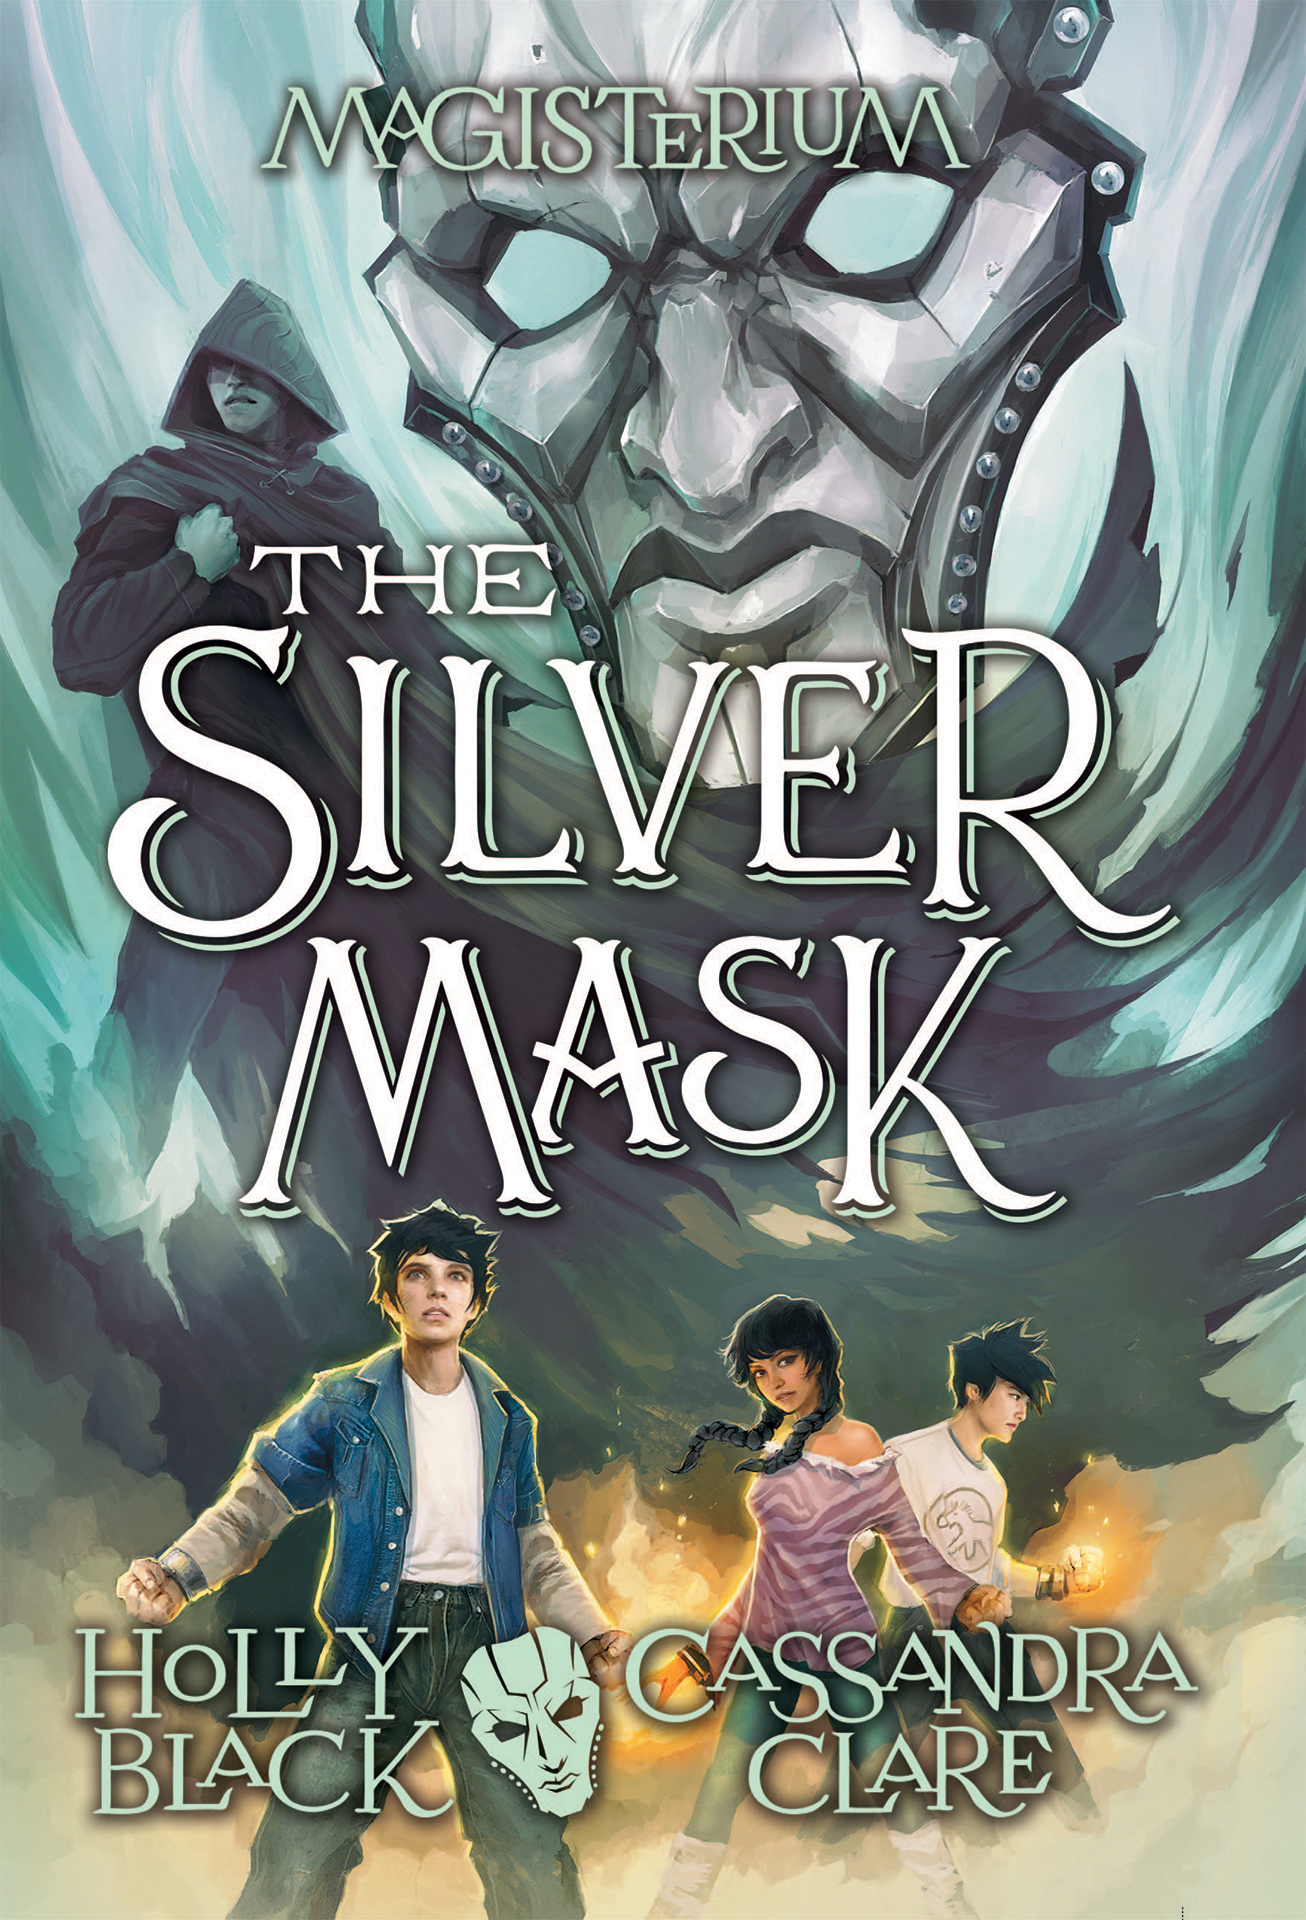 holly-black-silver-mask.jpg